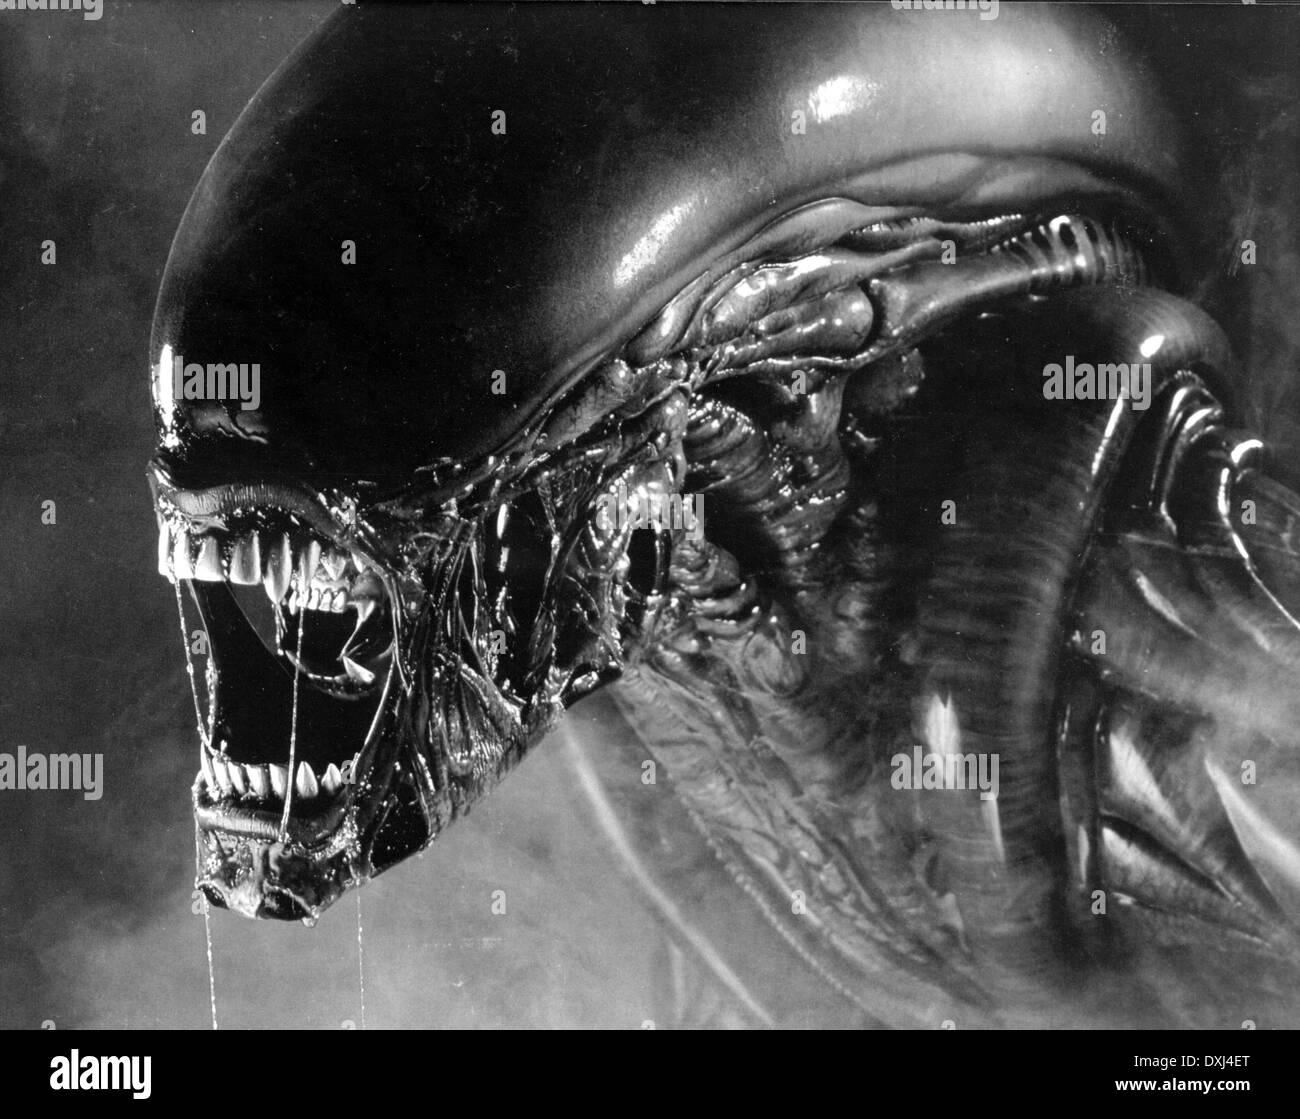 Alien Movie: Alien Movie Stock Photos & Alien Movie Stock Images